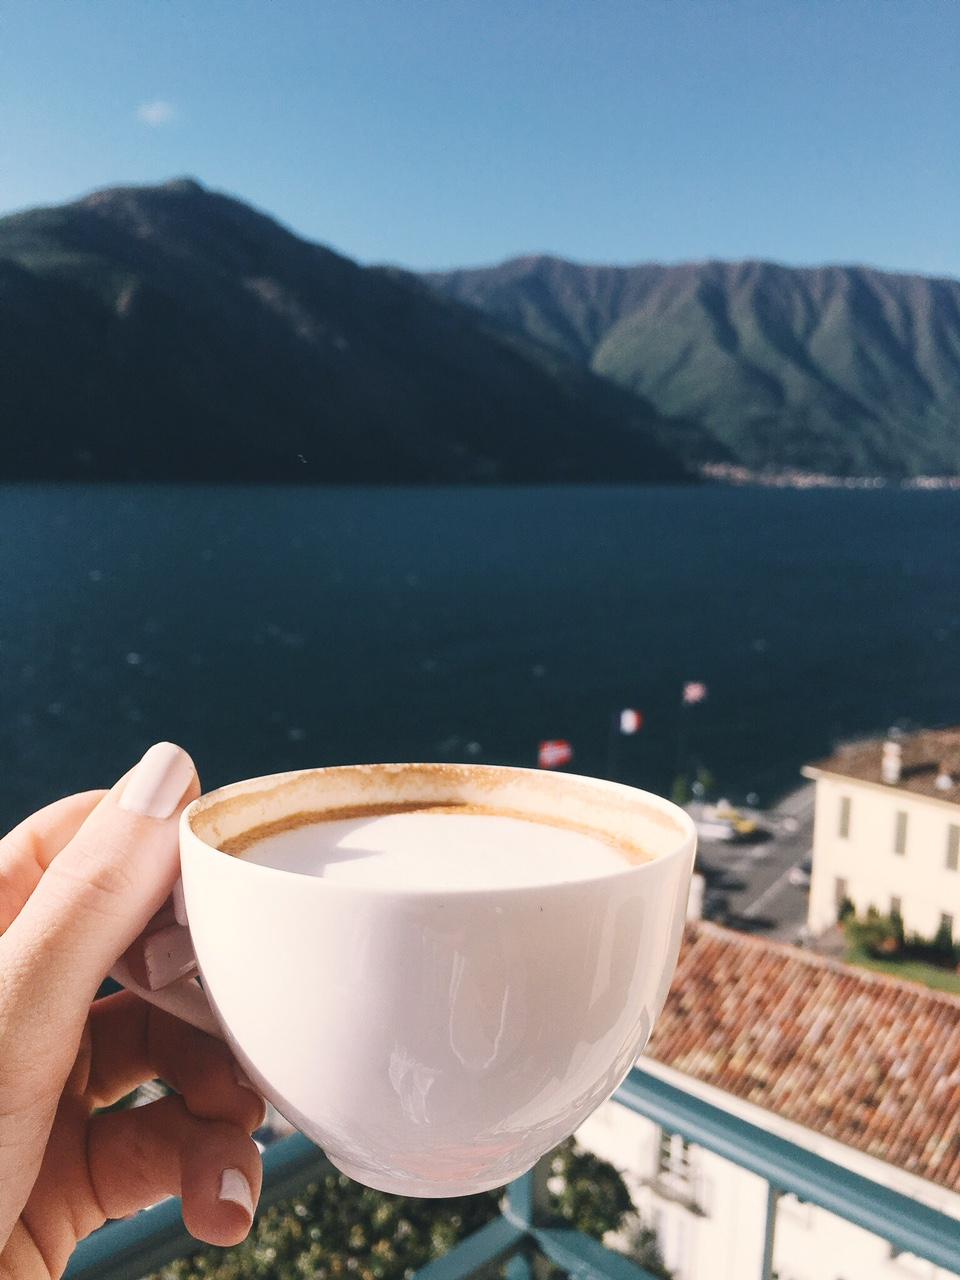 Lake Como view from balcony of Grand Hotel Tremezzo room